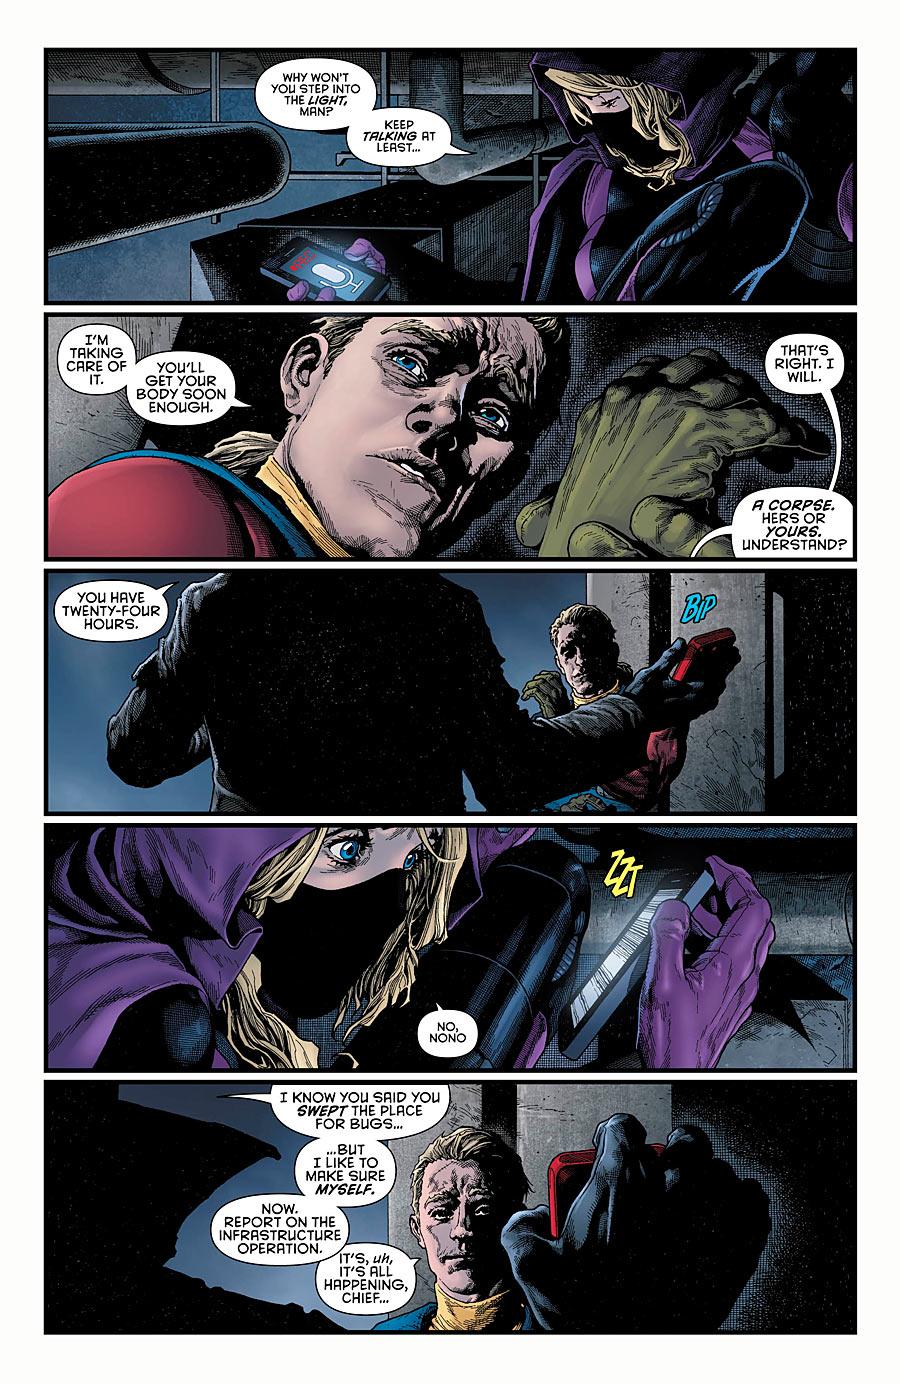 Batman Eternal #24 preview